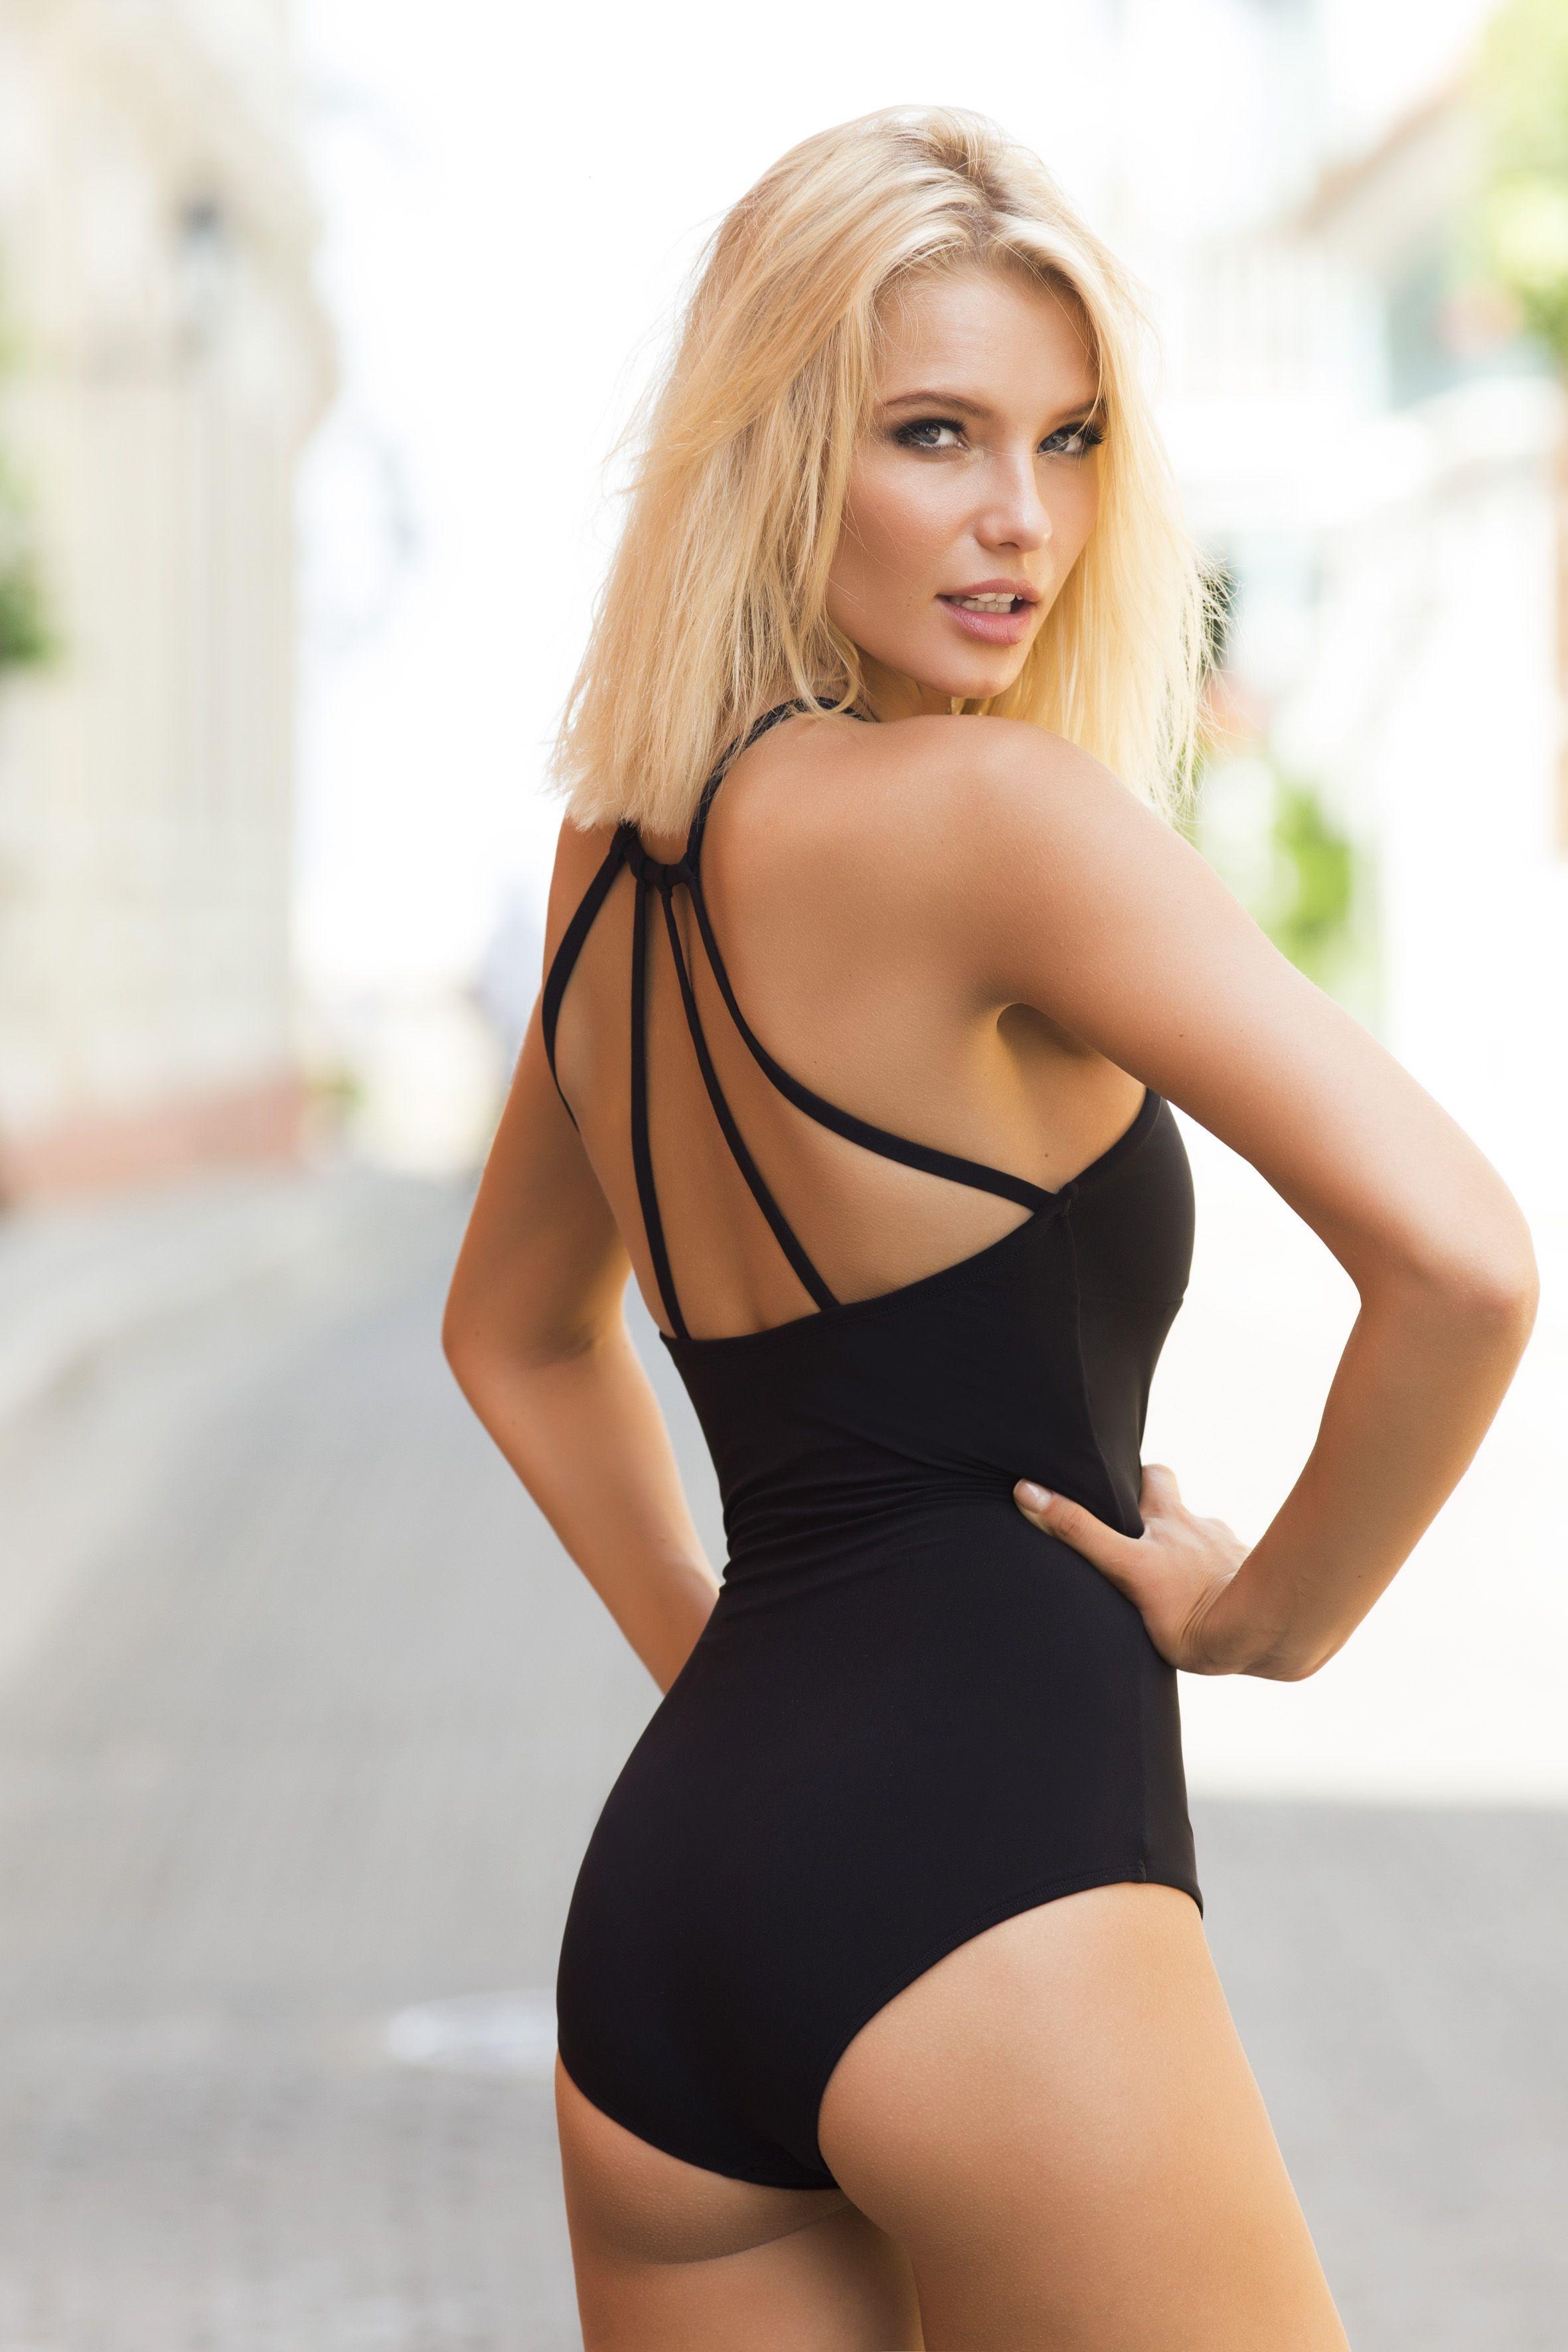 bb0dca759ae112dfc672de6418d5e32e gintare sudziute bikinis, enterizas, tangas playa pinterest,247 Swimwear